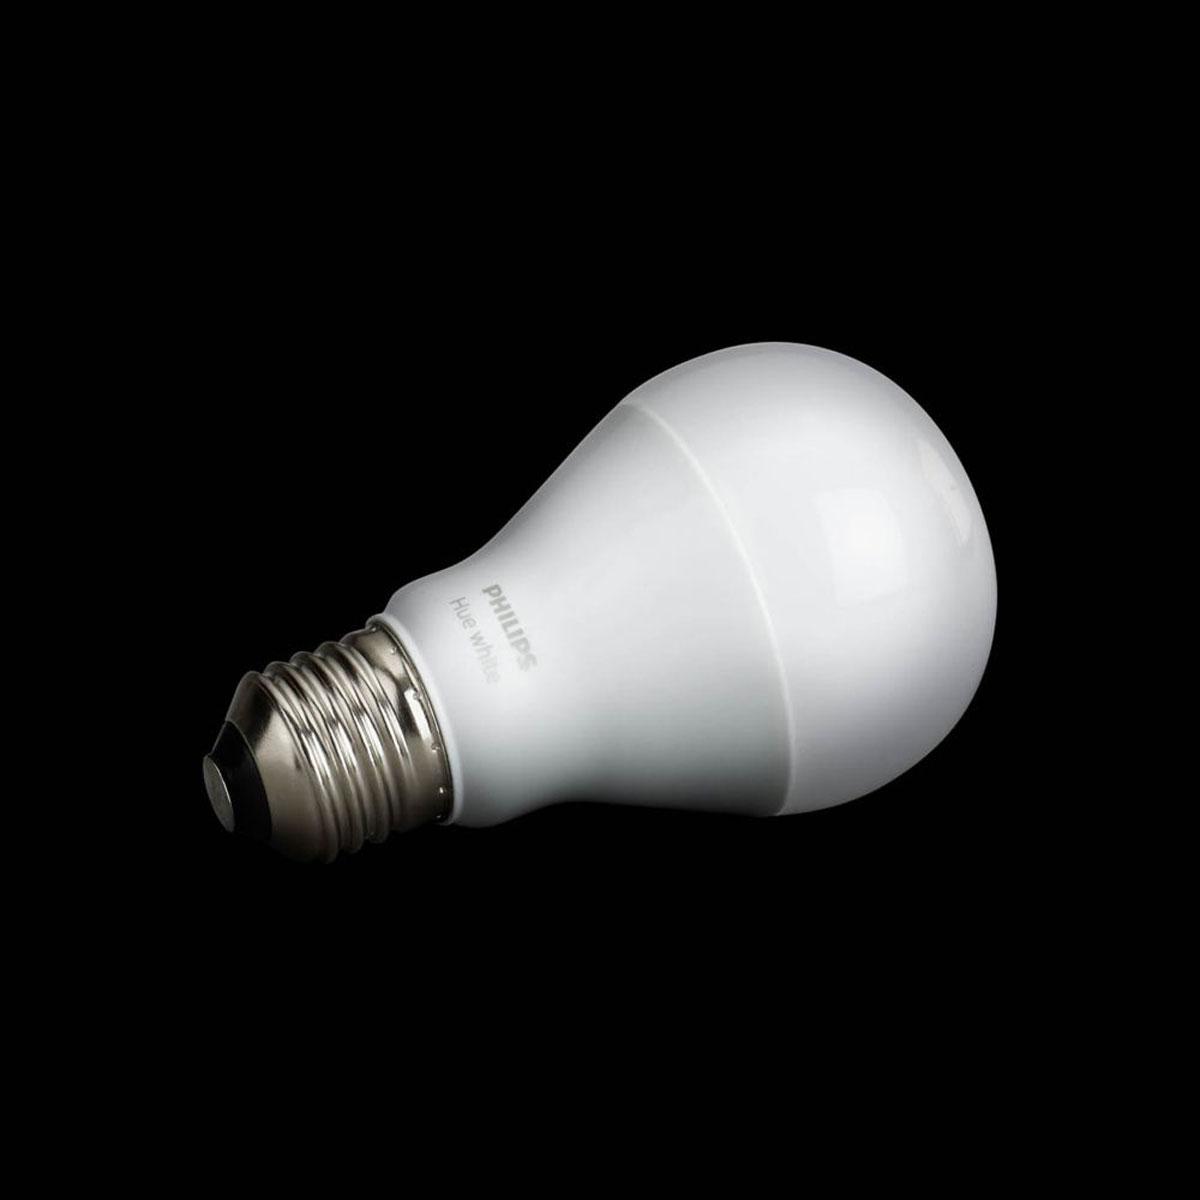 philips hue white e27 losse lamp. Black Bedroom Furniture Sets. Home Design Ideas